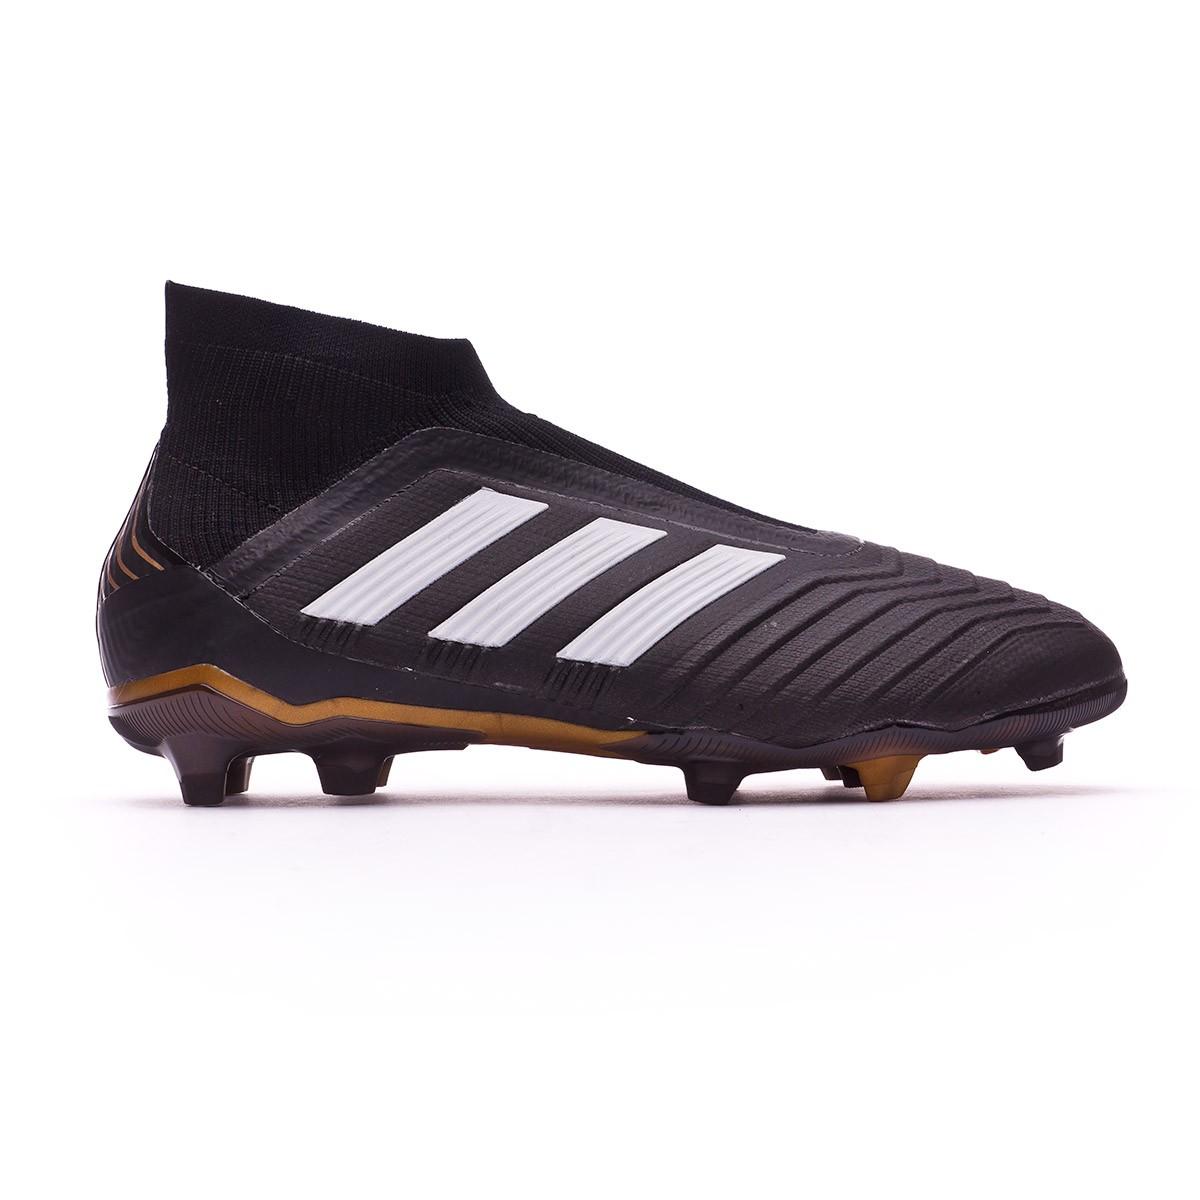 2f3240bf7ff59 Zapatos de fútbol adidas Predator 18+ FG Niño Core black-White-Gold  metallic-Solar red - Tienda de fútbol Fútbol Emotion